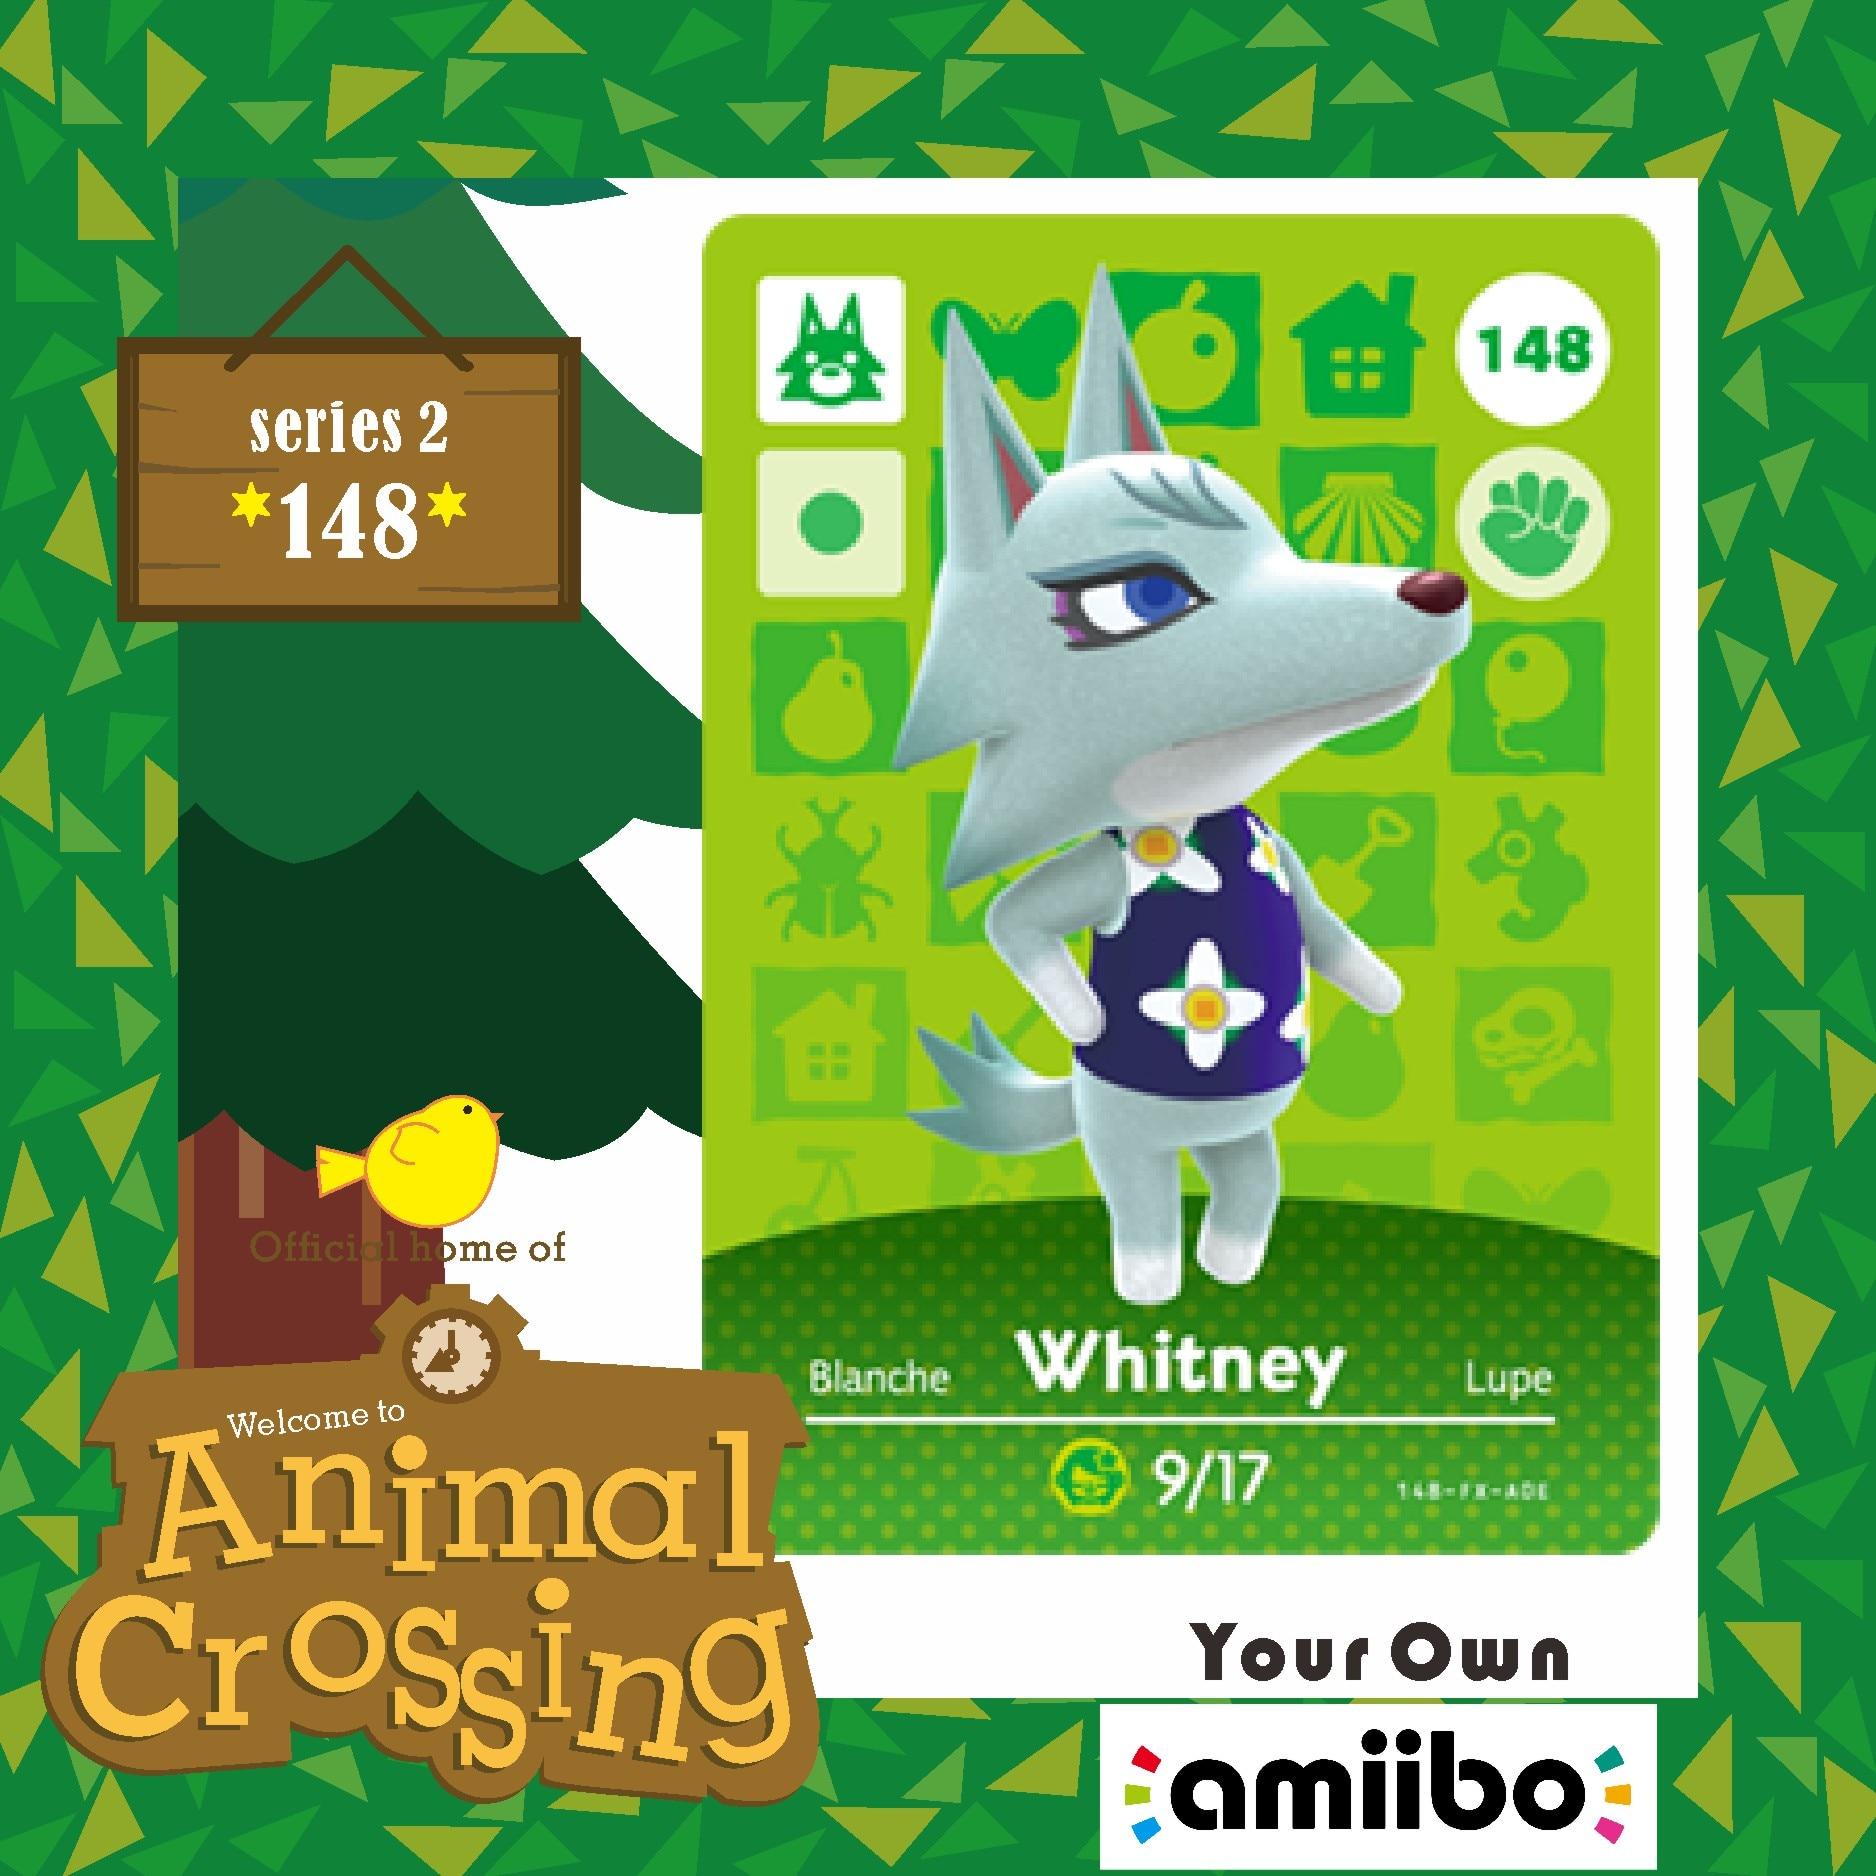 148 Animal Crossing Whitney Animal Crossing Amiibo Whitney Amiibo Whitney Animal Crossing Whitney Animal Crossing Amiibo 148